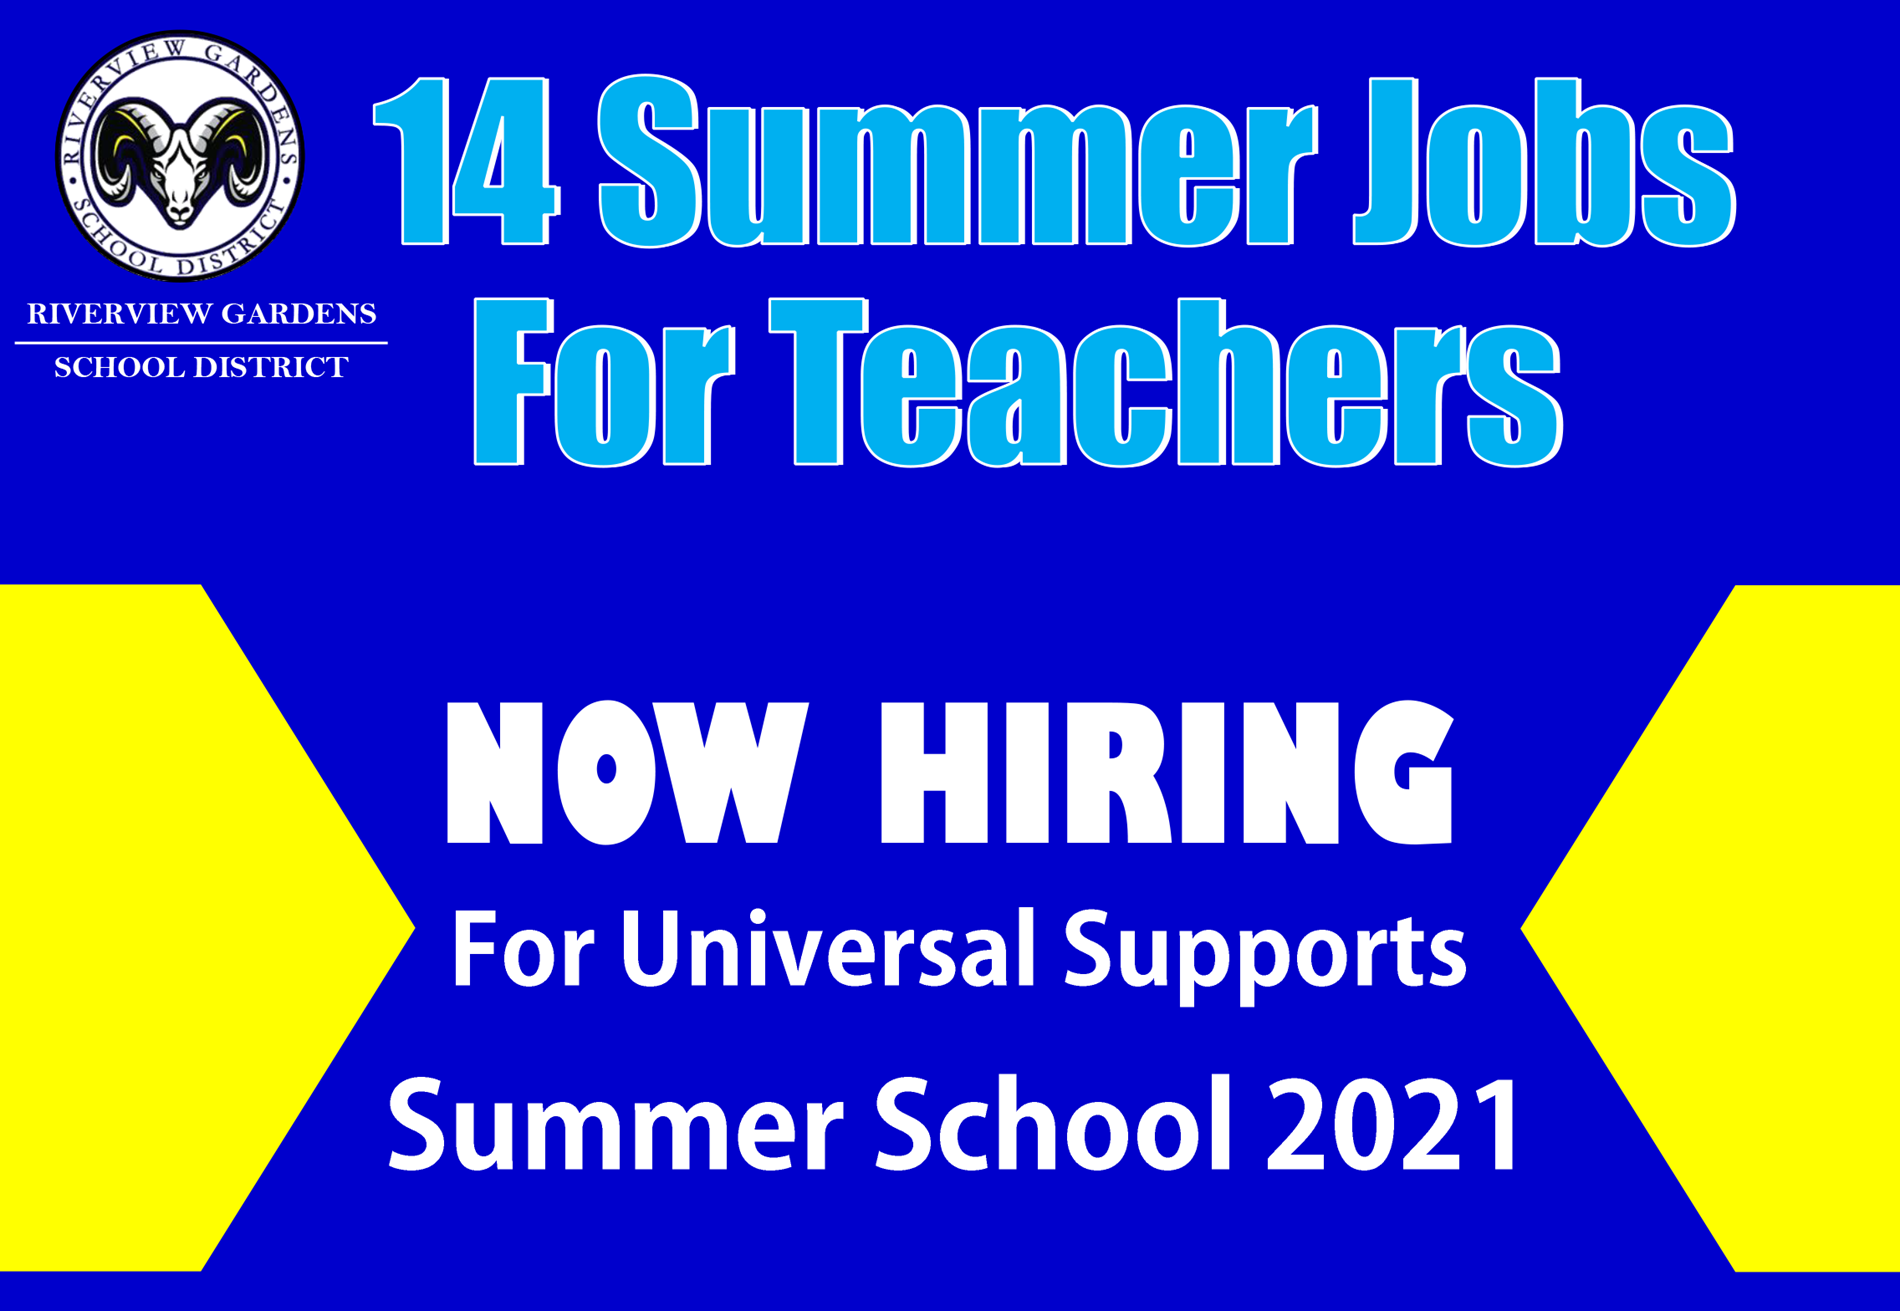 14 Summer Jobs for Teachers